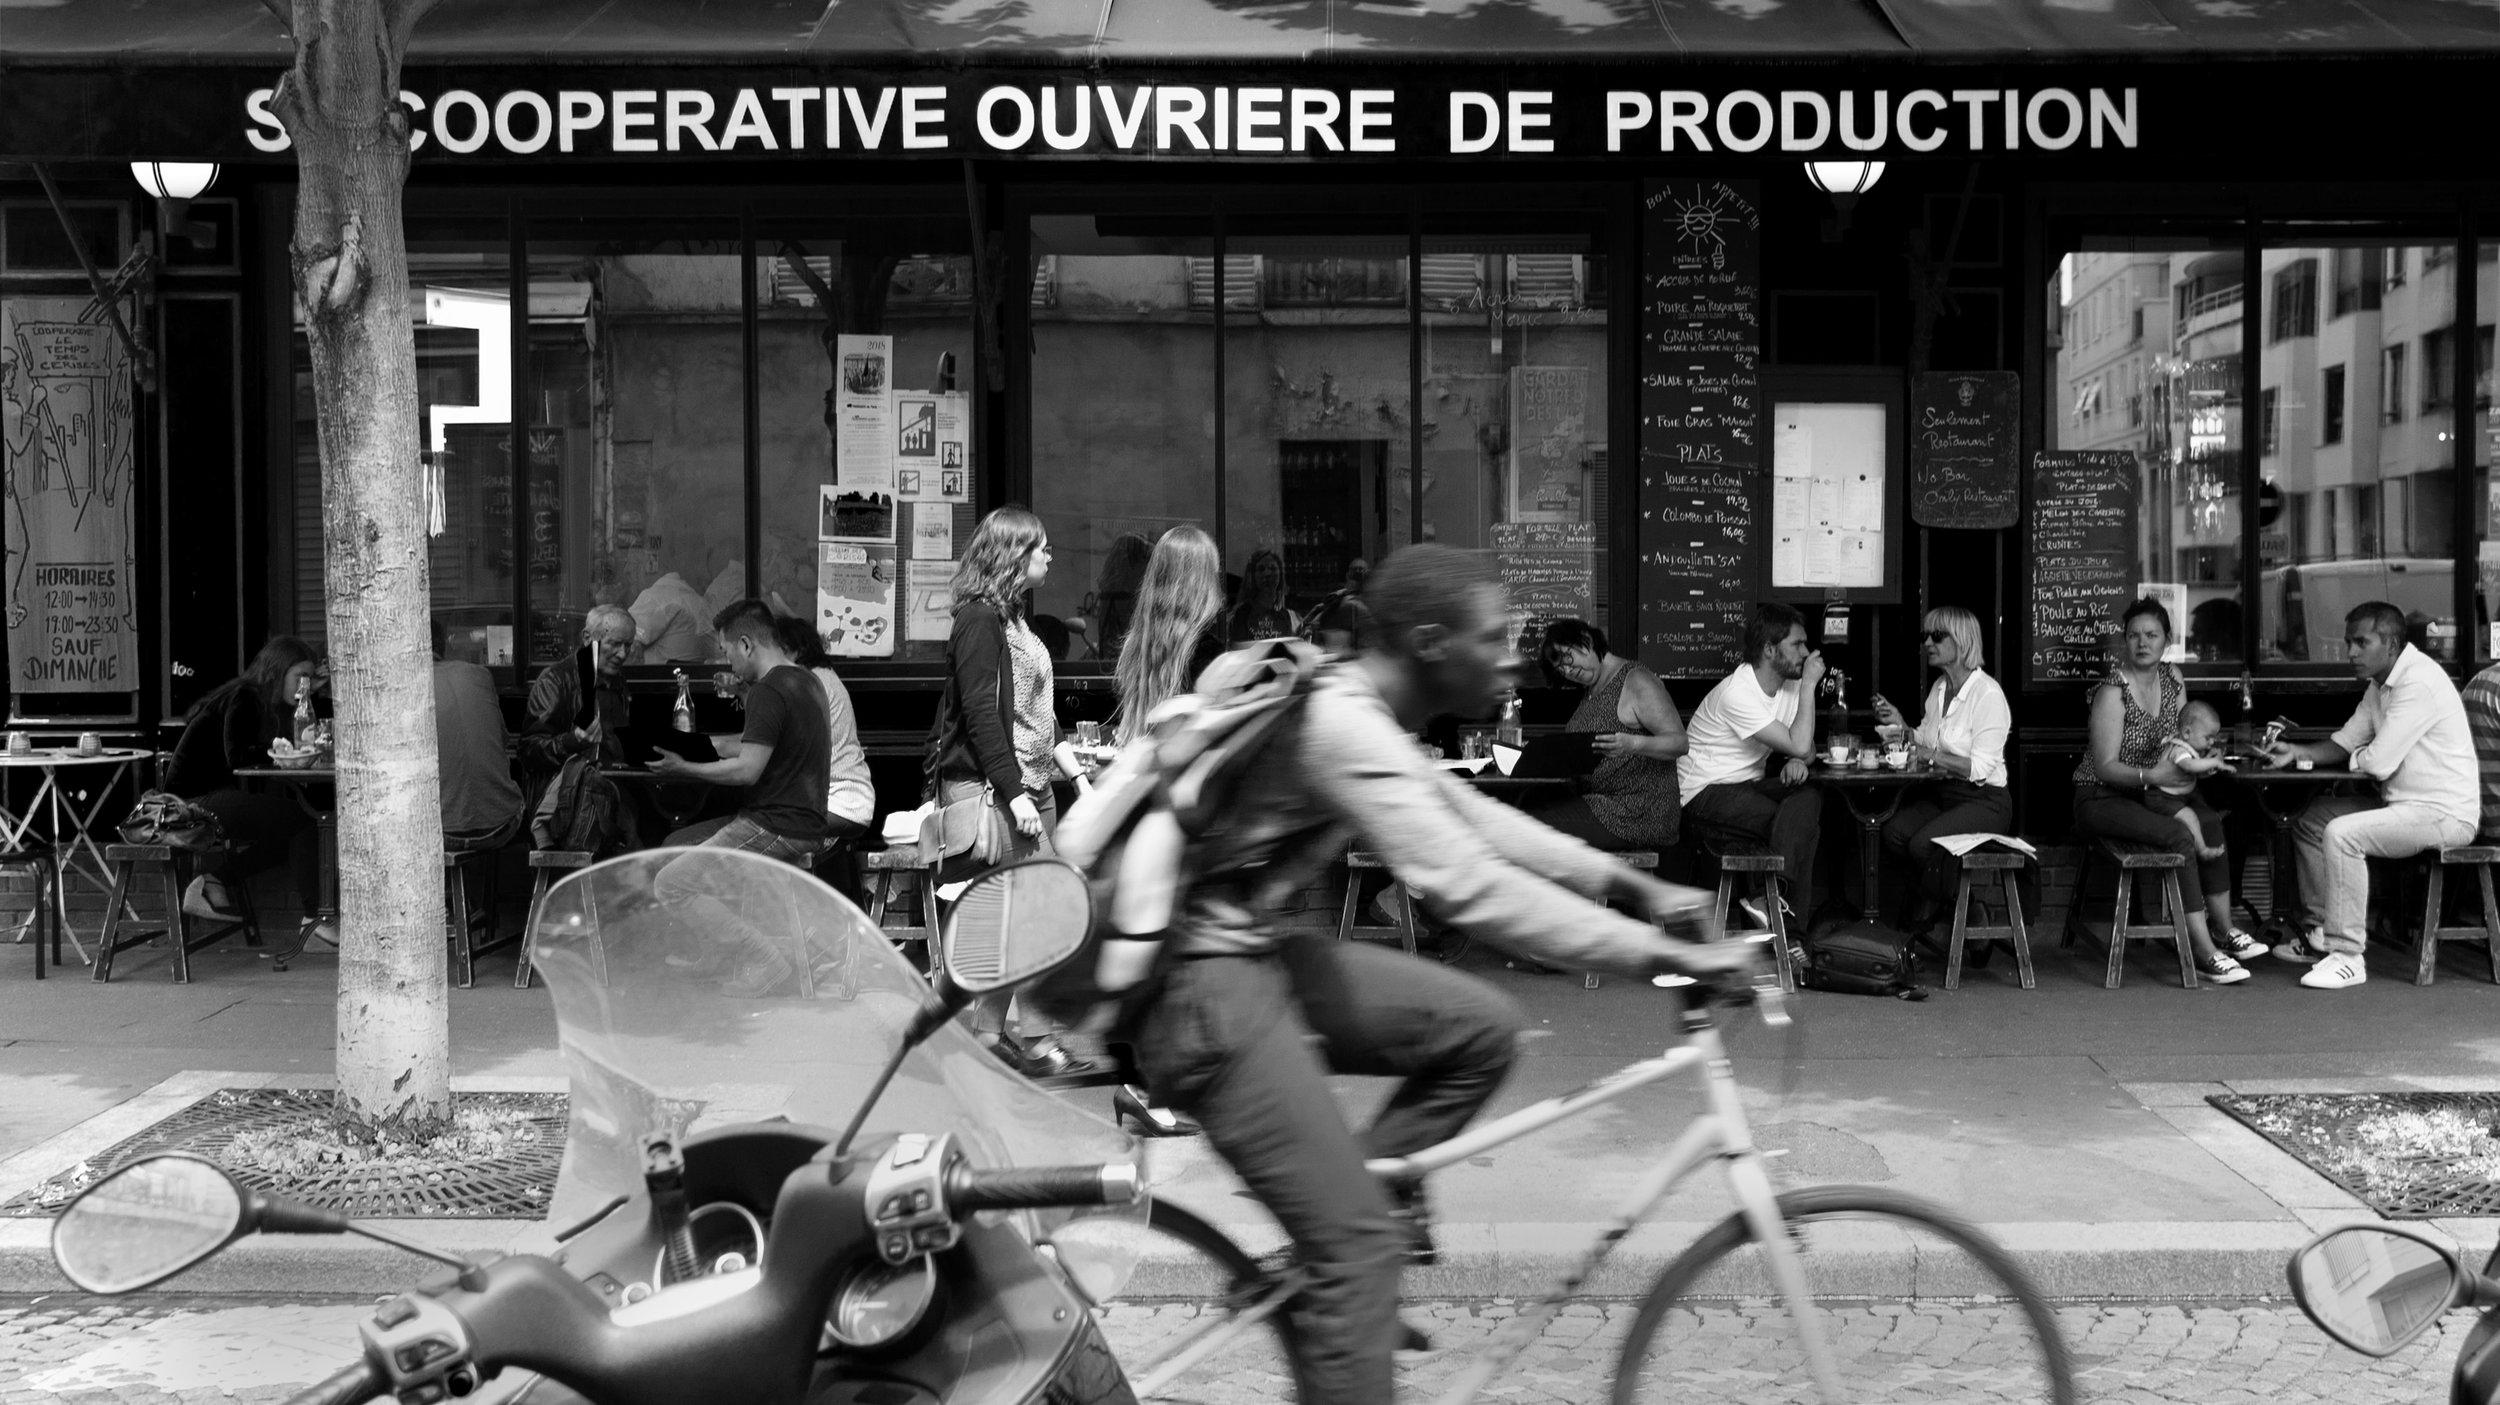 Bicyclist2BW.jpg